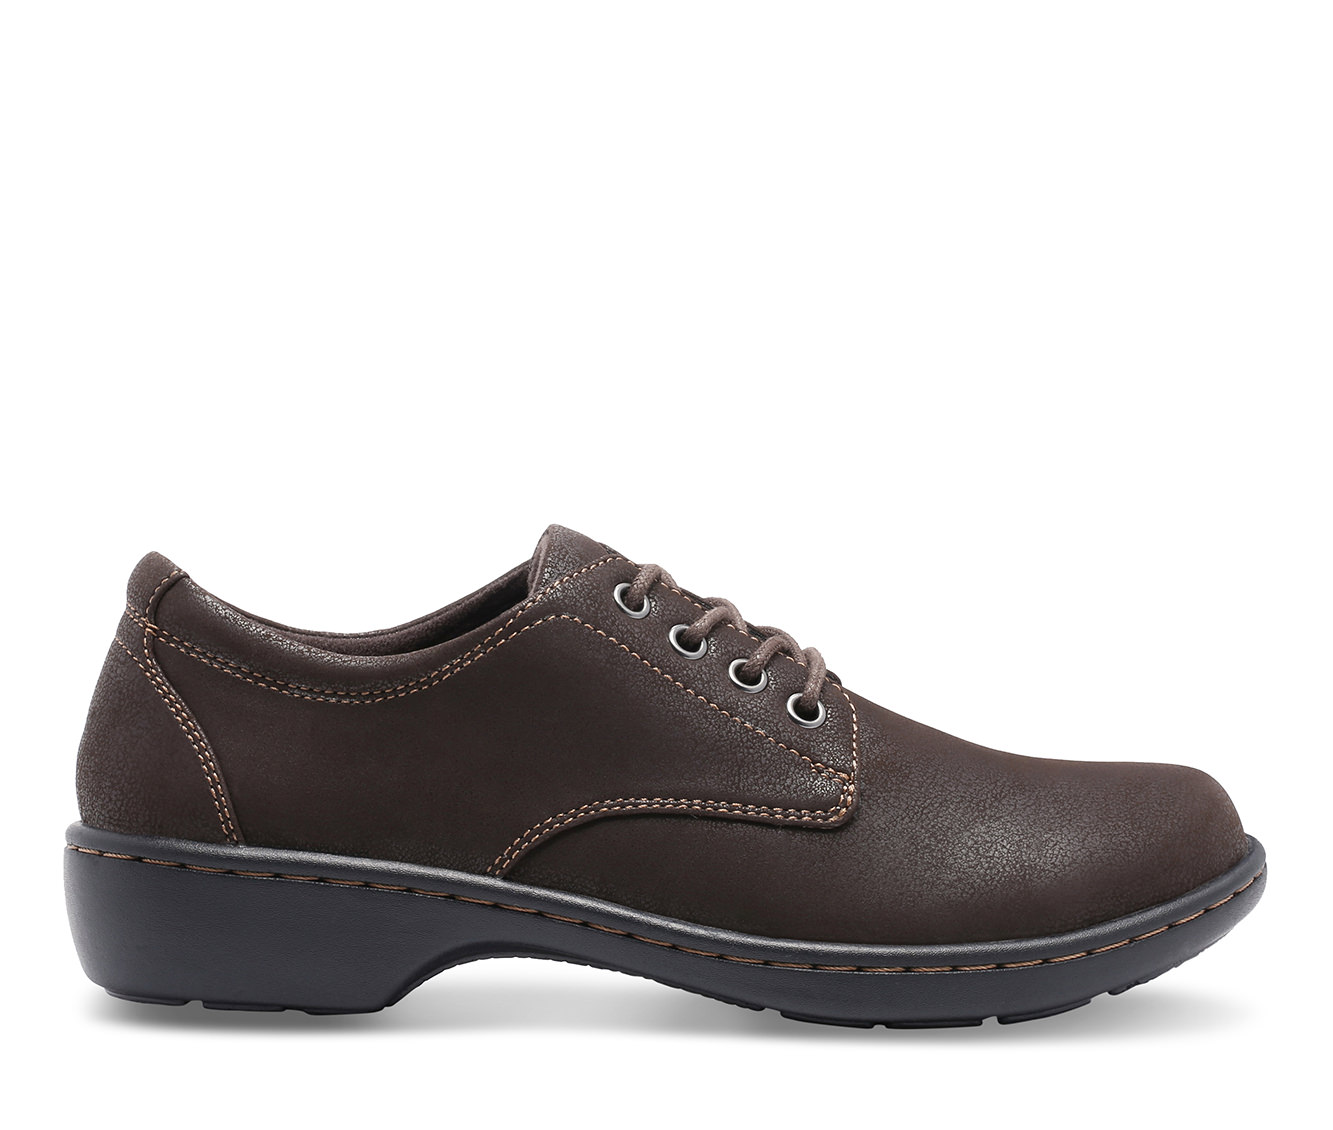 Eastland Pandora Women's Shoe (Brown Faux Leather)